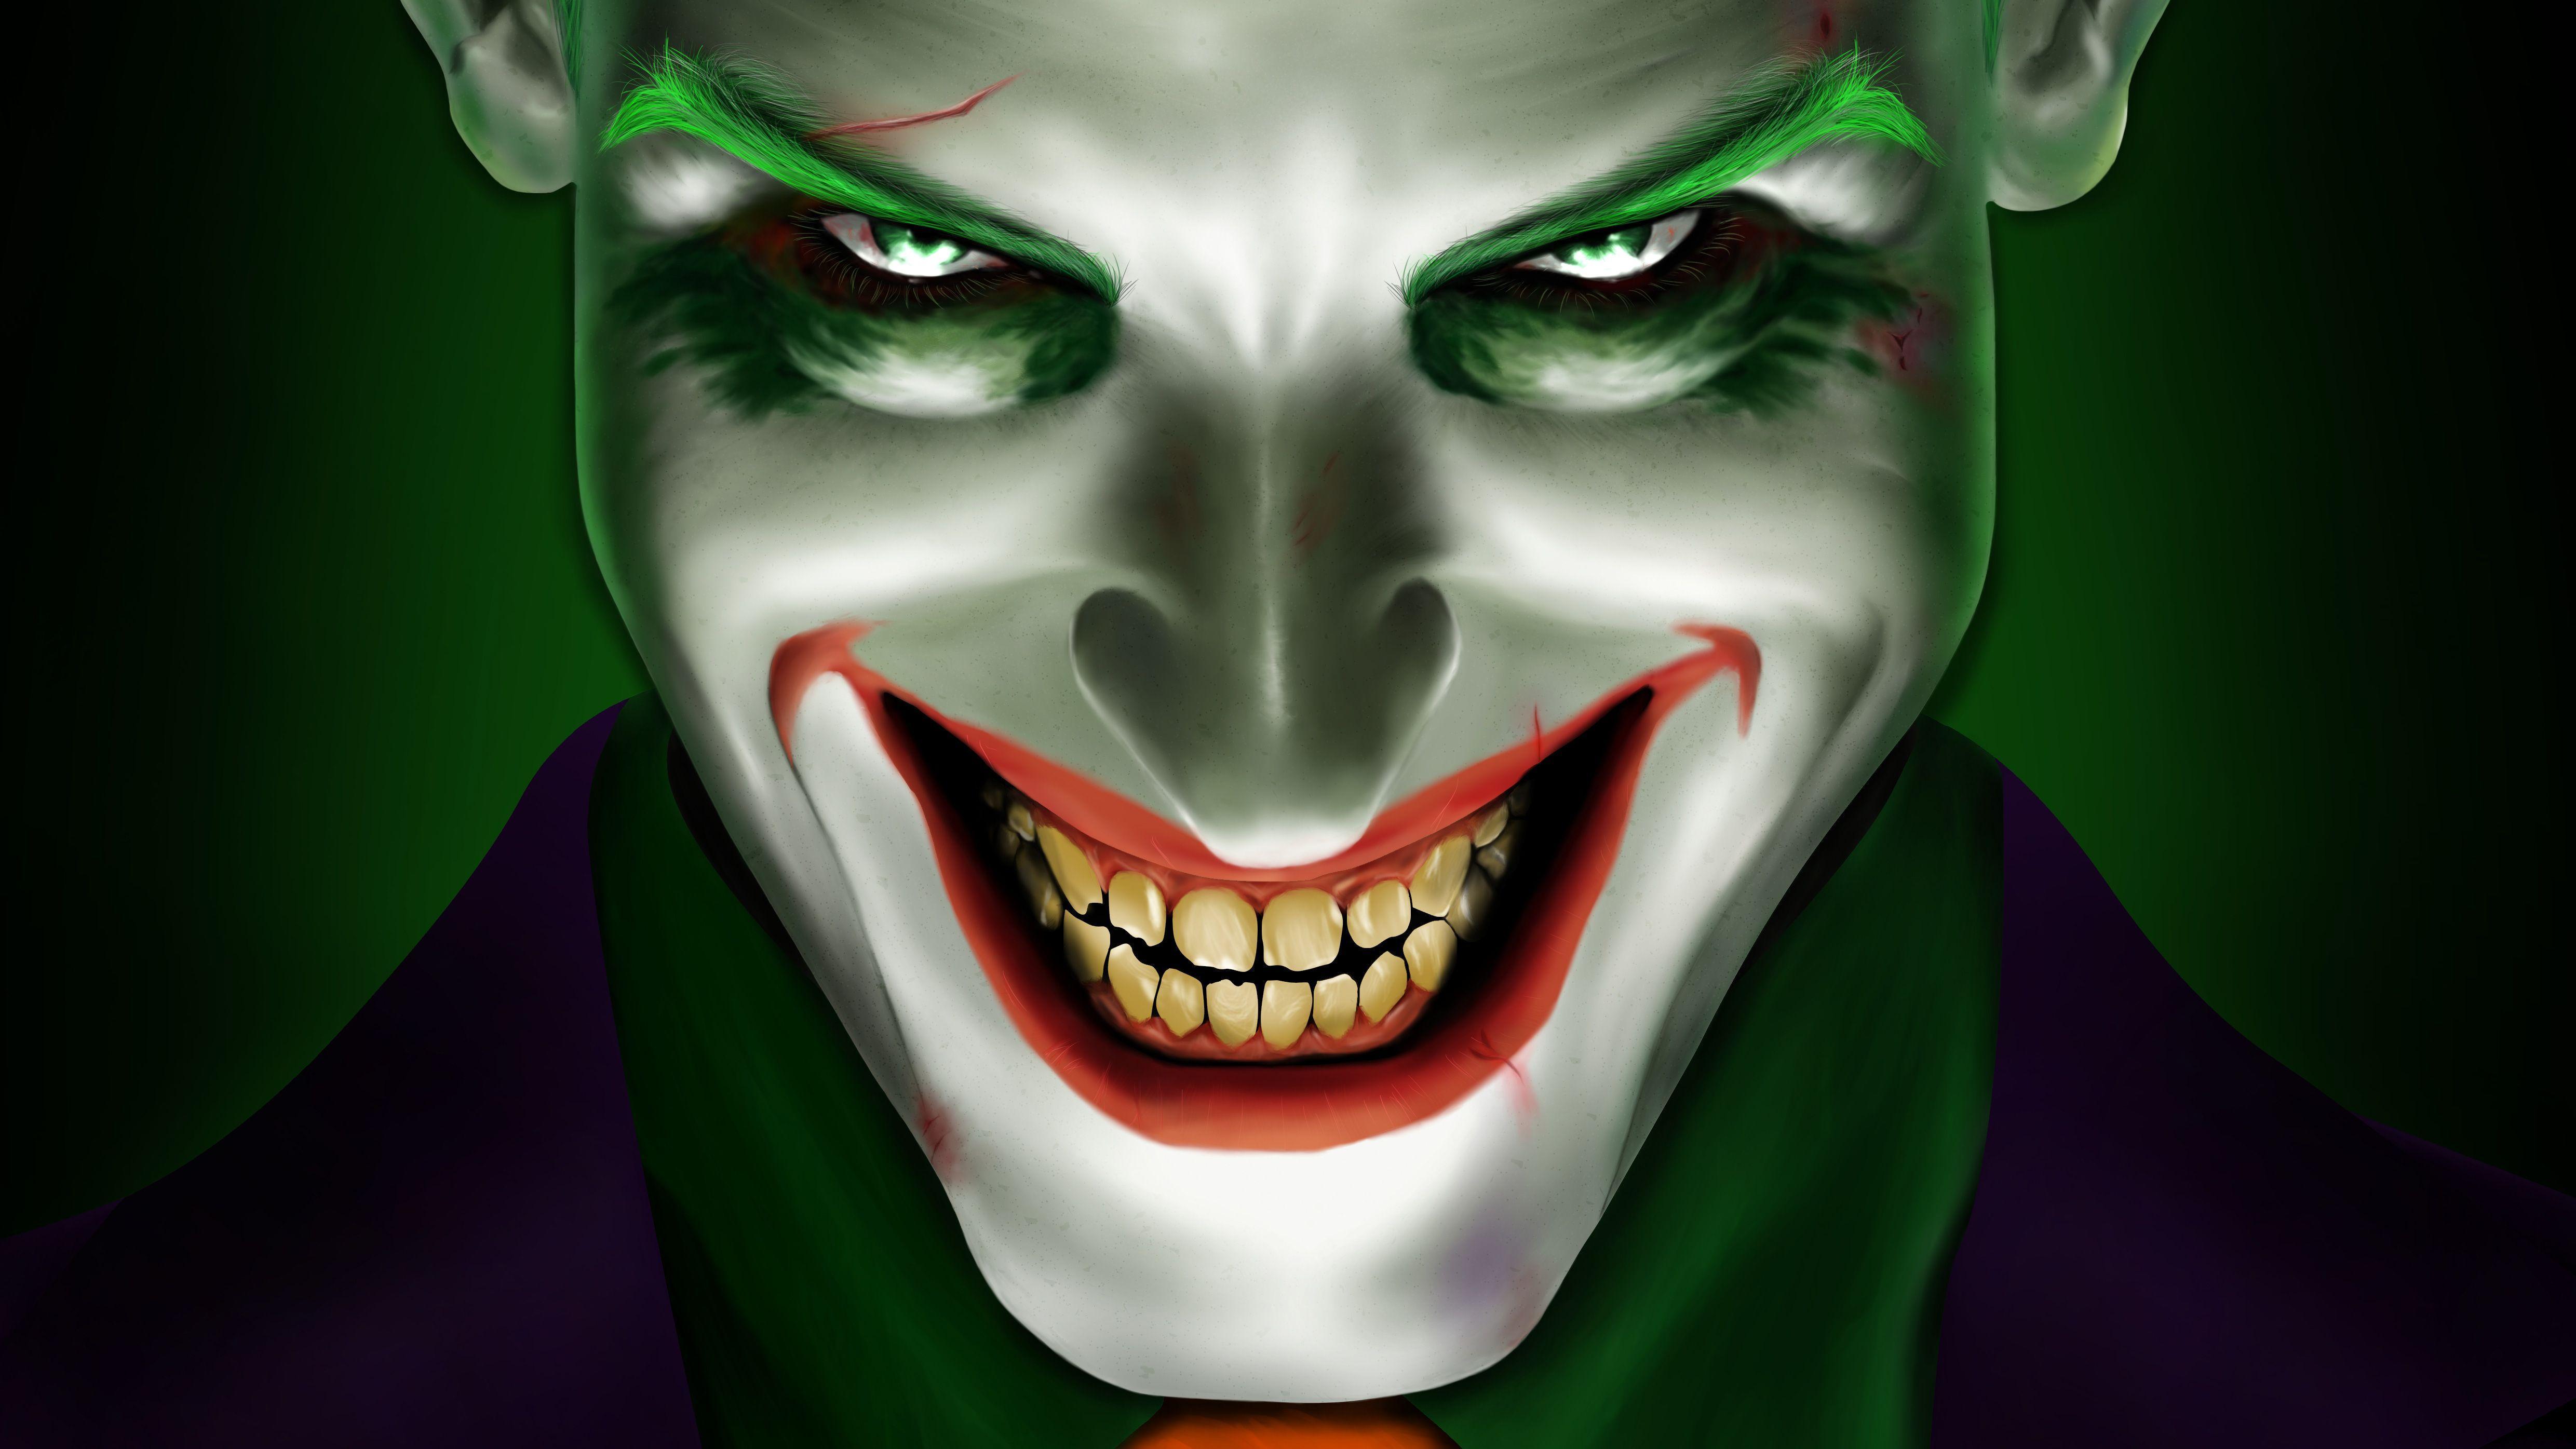 Joker Smile Wallpapers Top Free Joker Smile Backgrounds Wallpaperaccess Joker smile @jokersmilemusic 15 сент. joker smile wallpapers top free joker